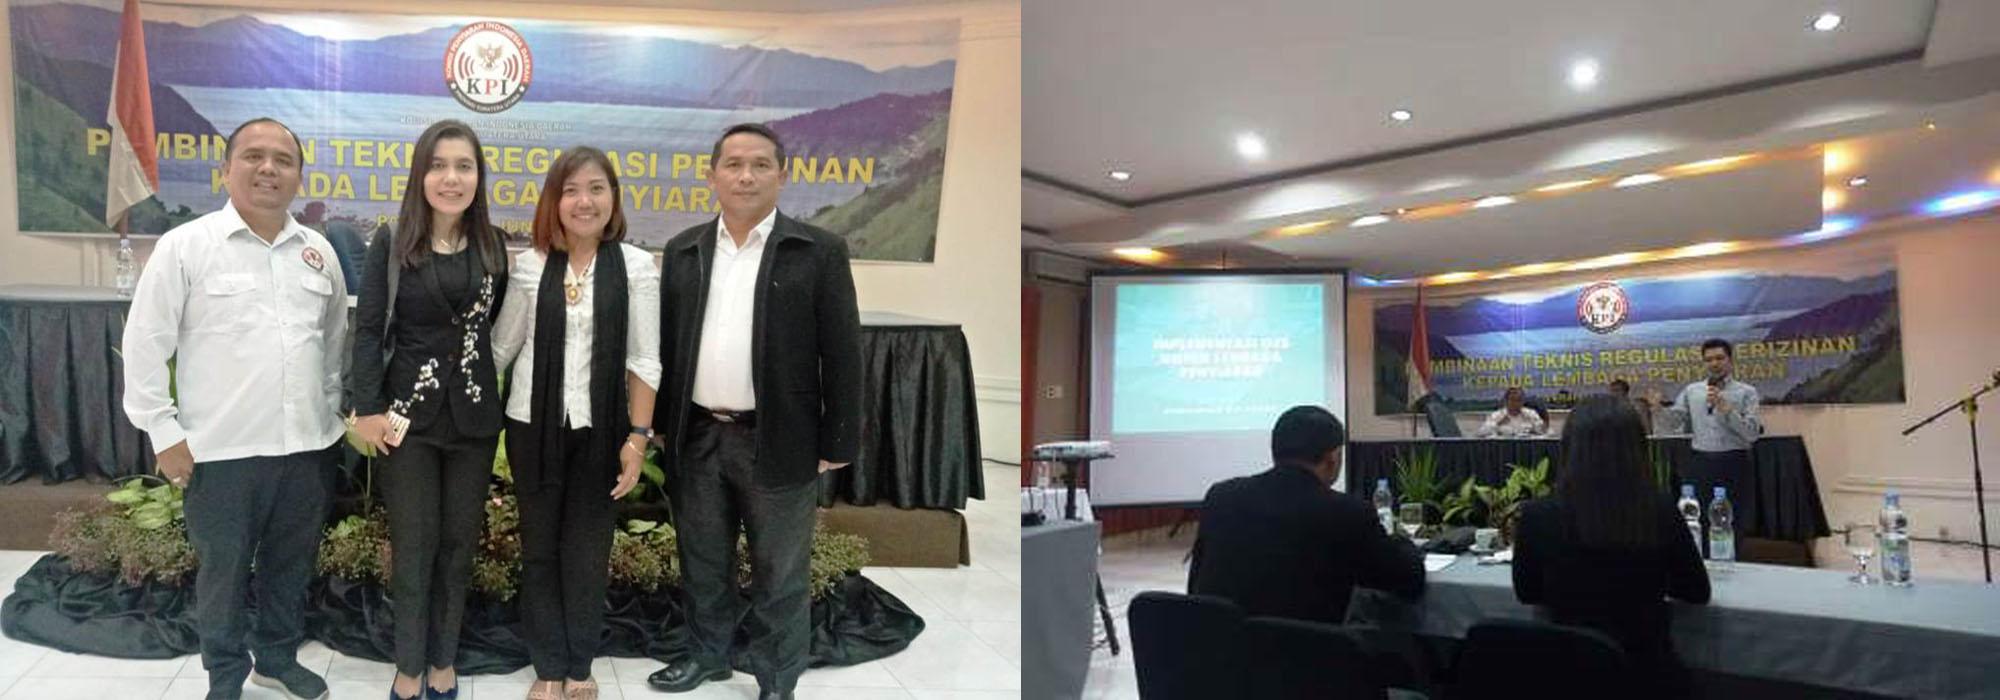 Kominfo Sergai Turut Serta Pembinaan Teknis Regulasi Perizinan Lembaga Penyiaran